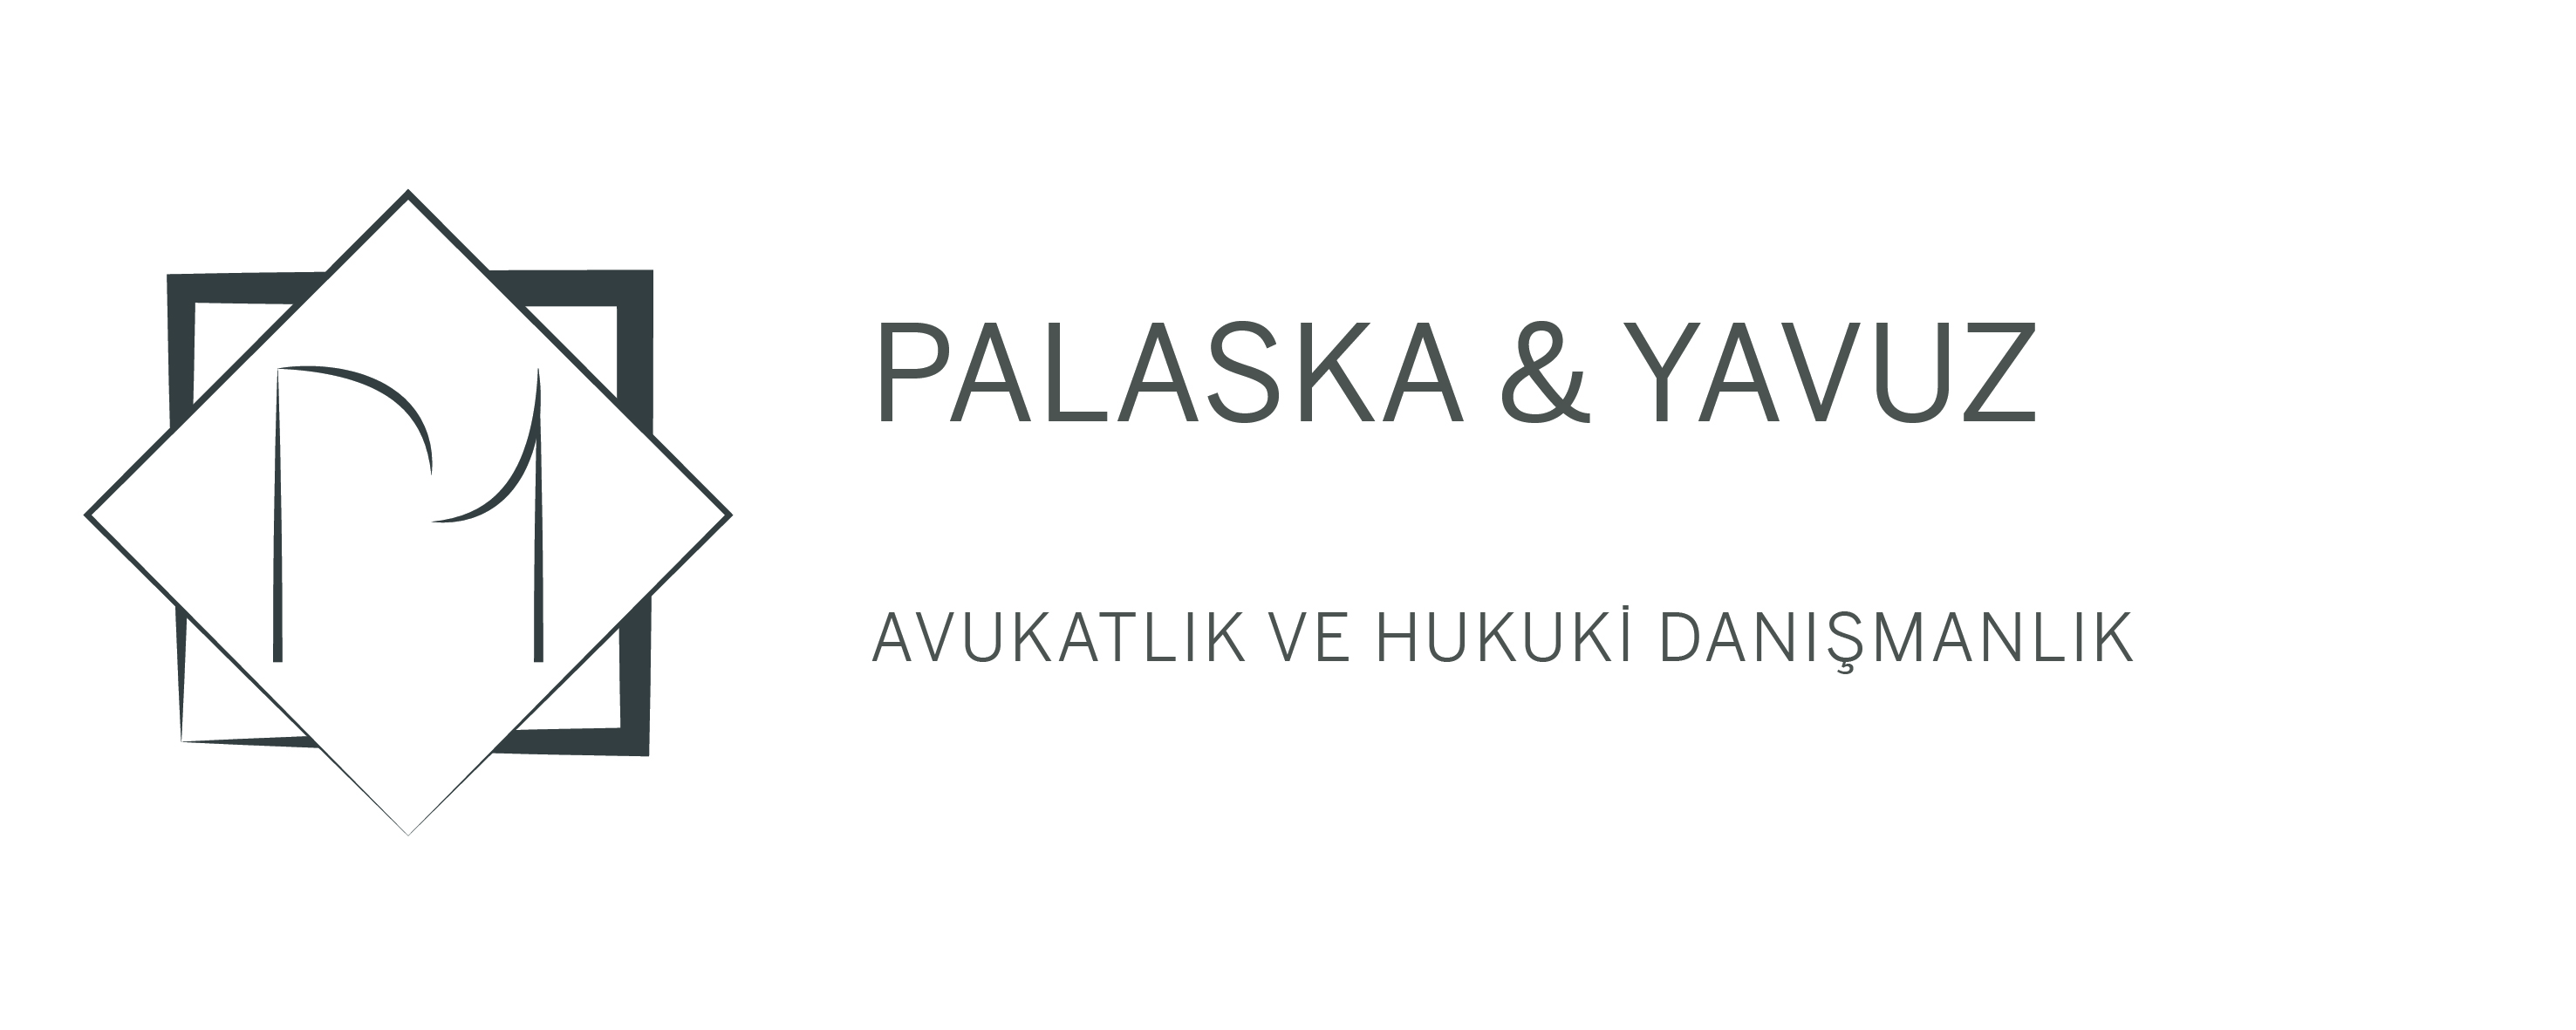 Py Hukuk